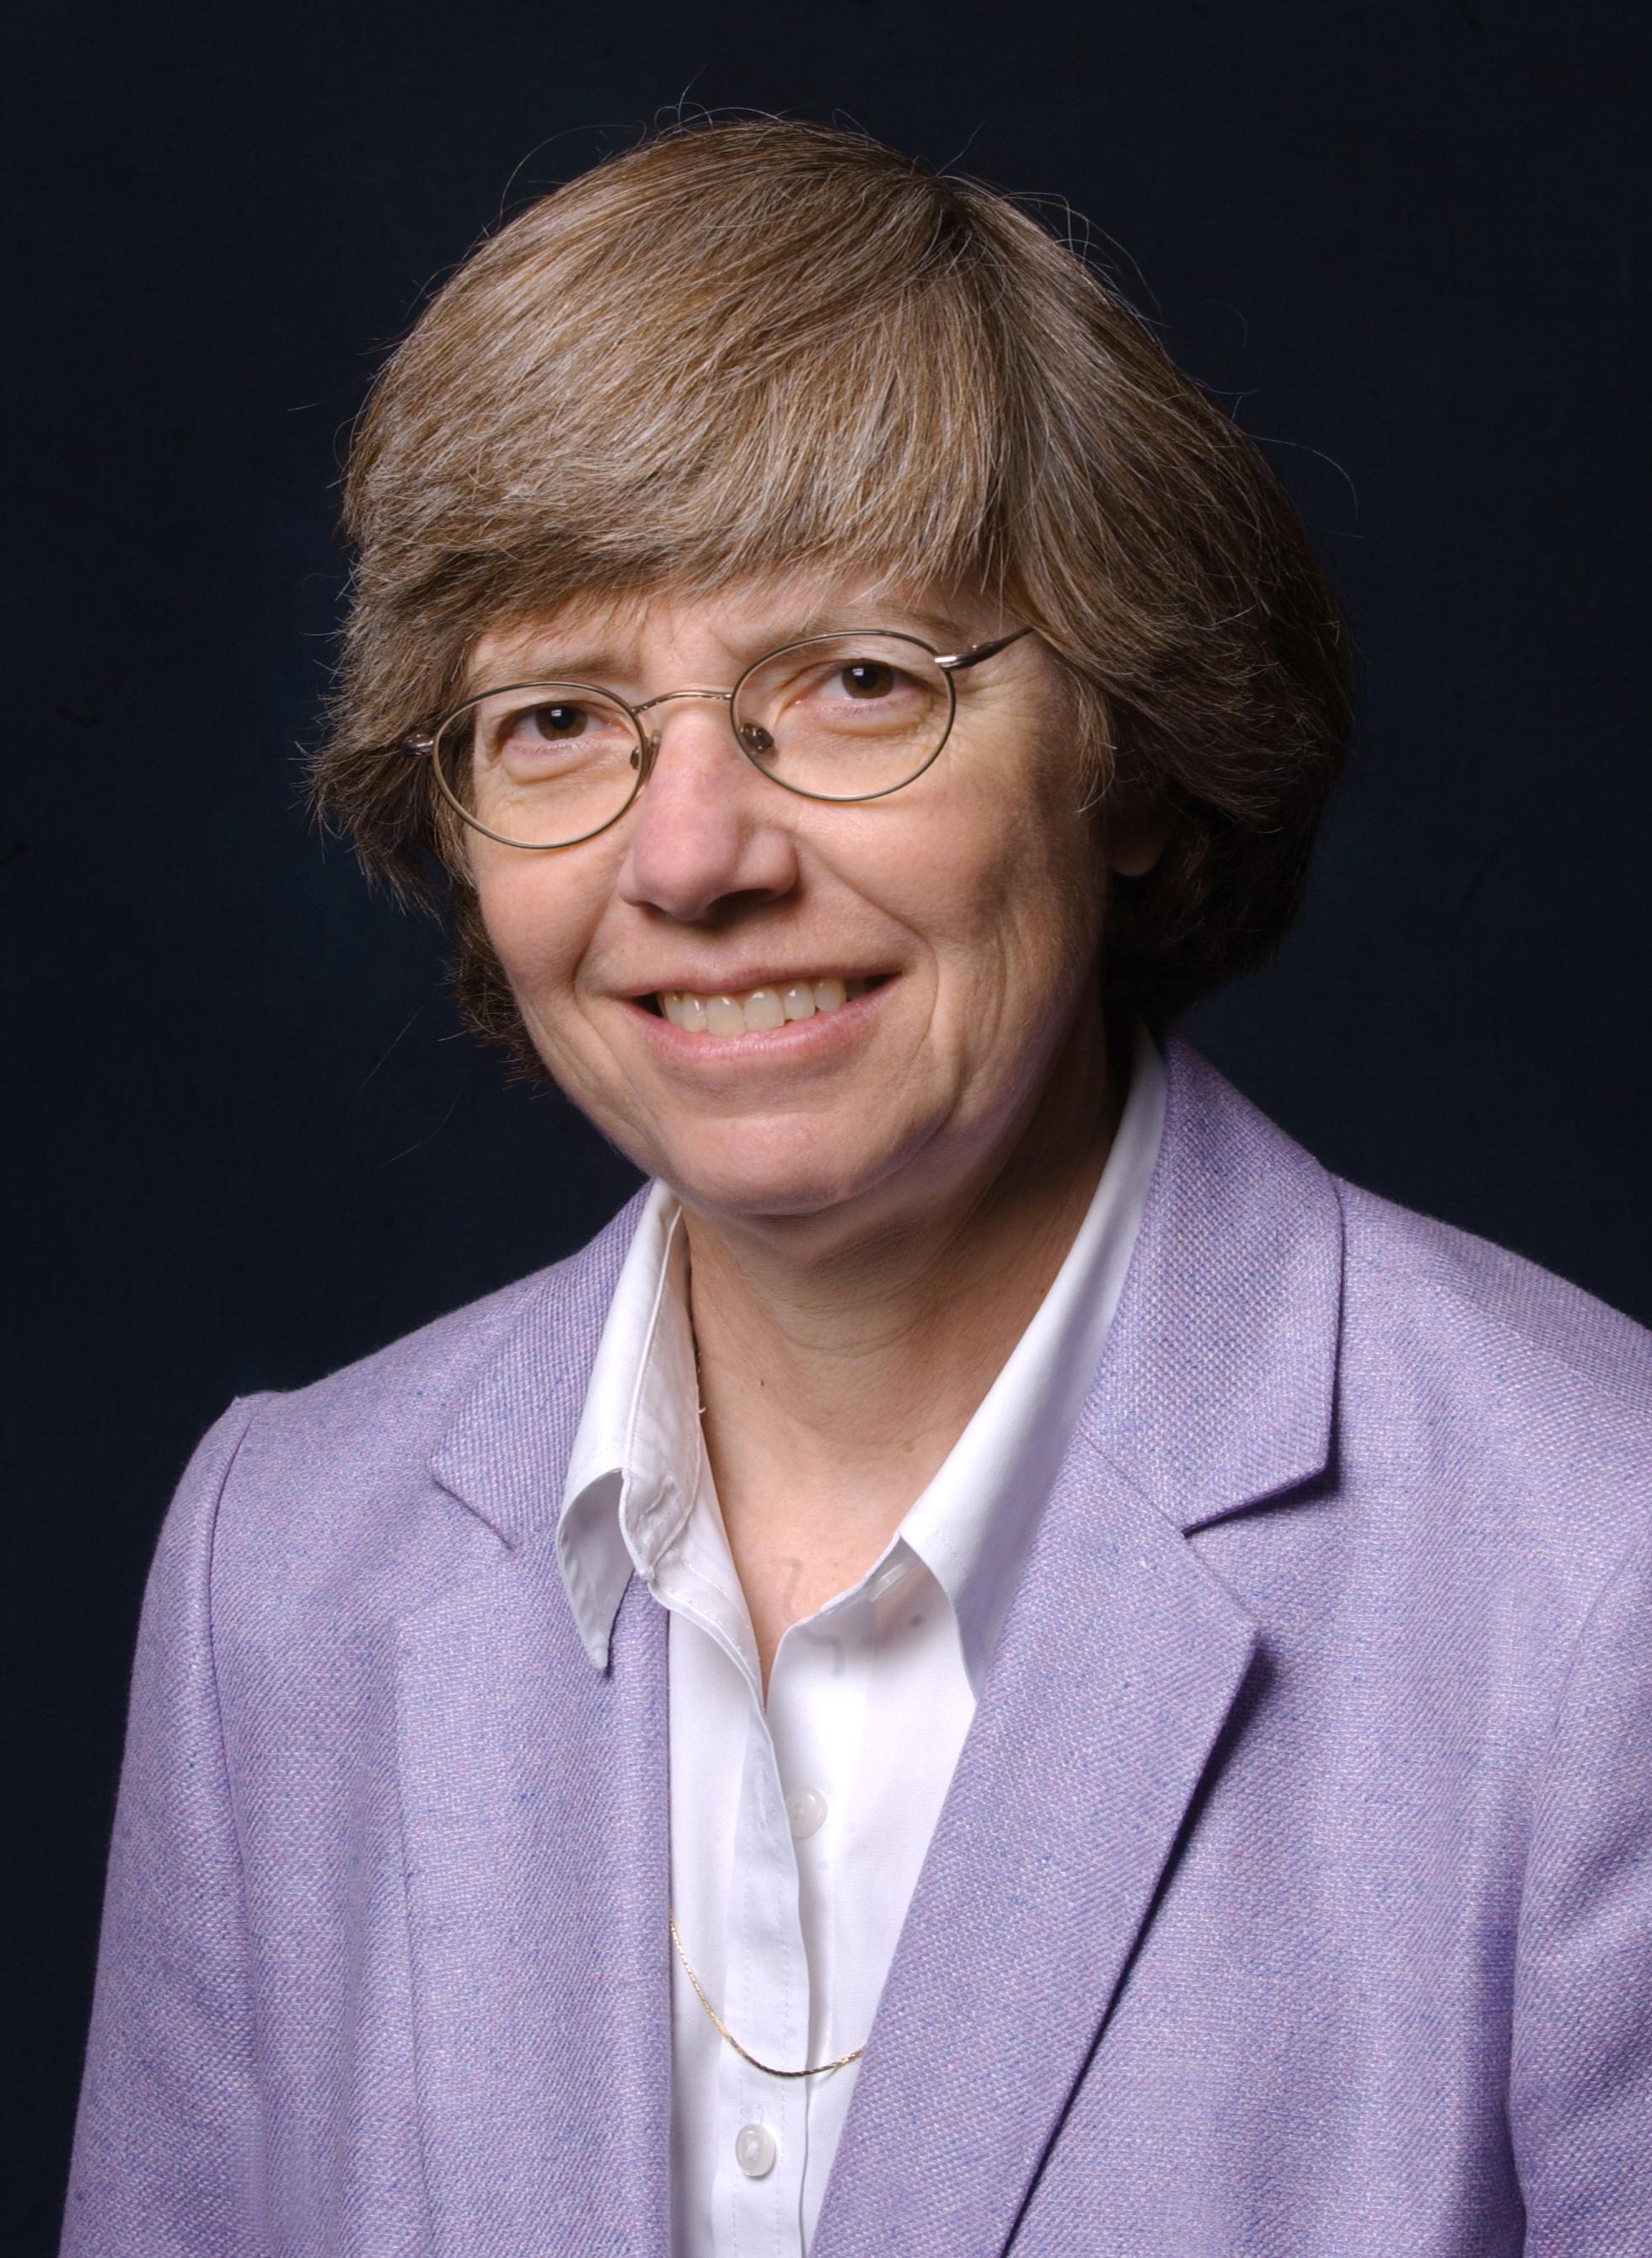 Dr. Rosemary Roberts '66